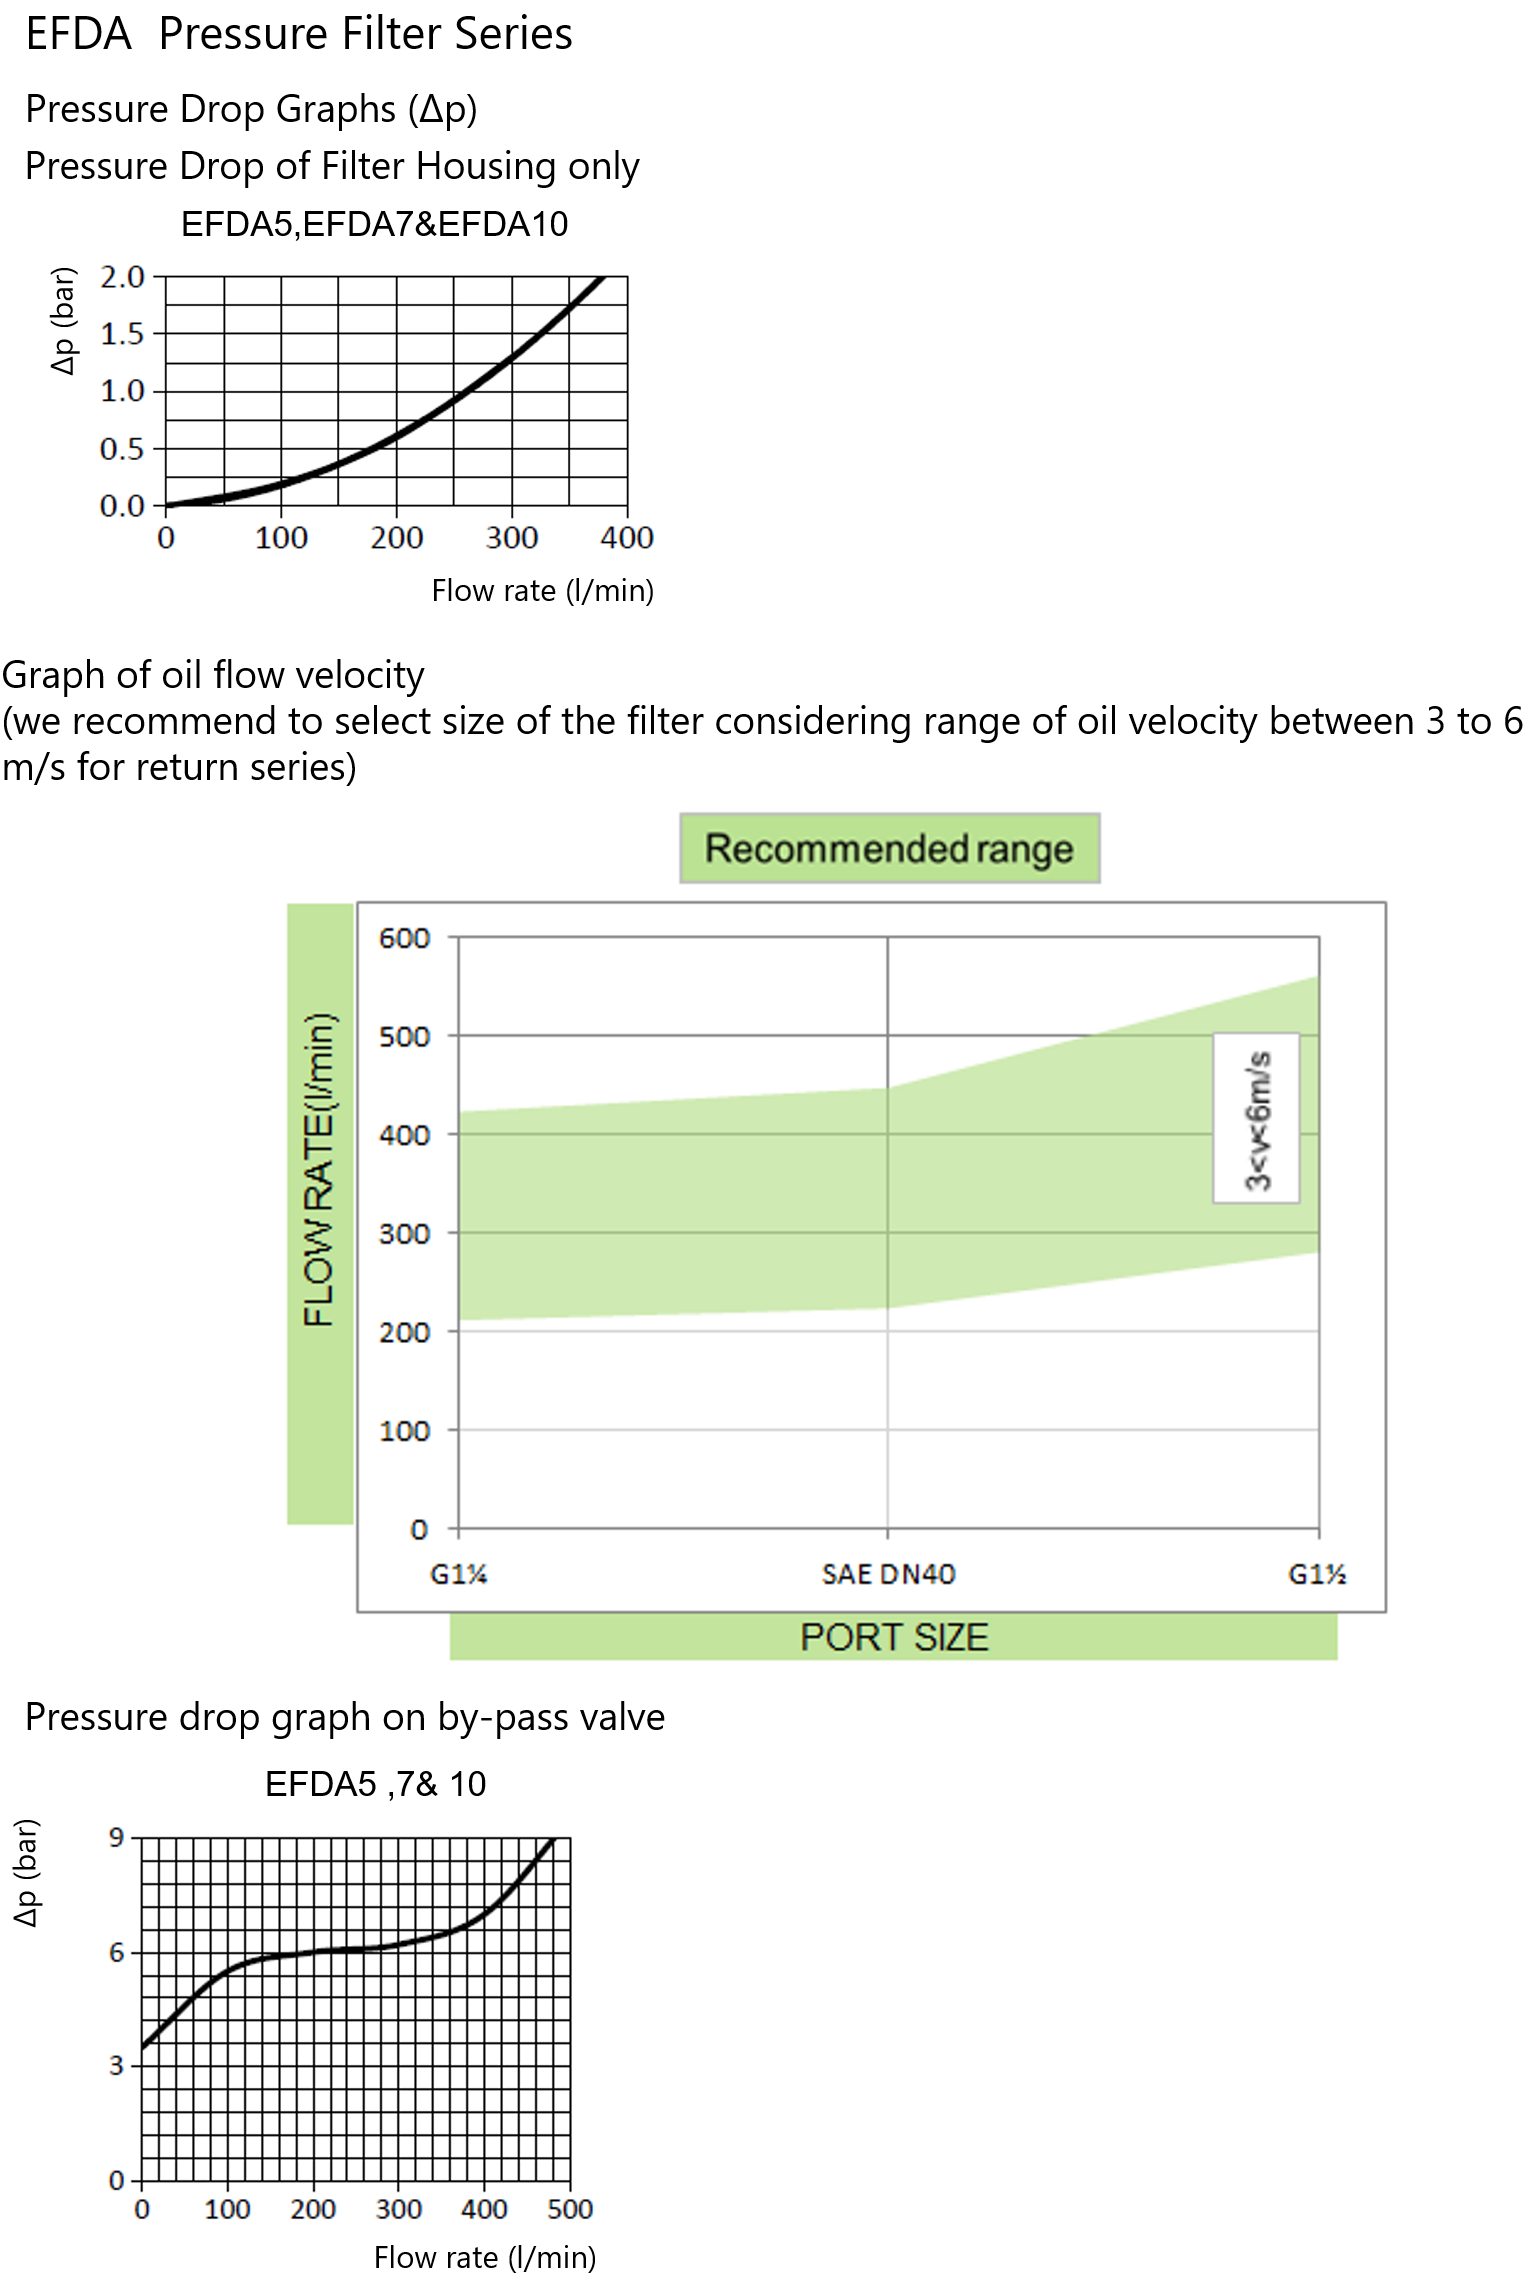 EVOTEK EFDA pressure drop performance